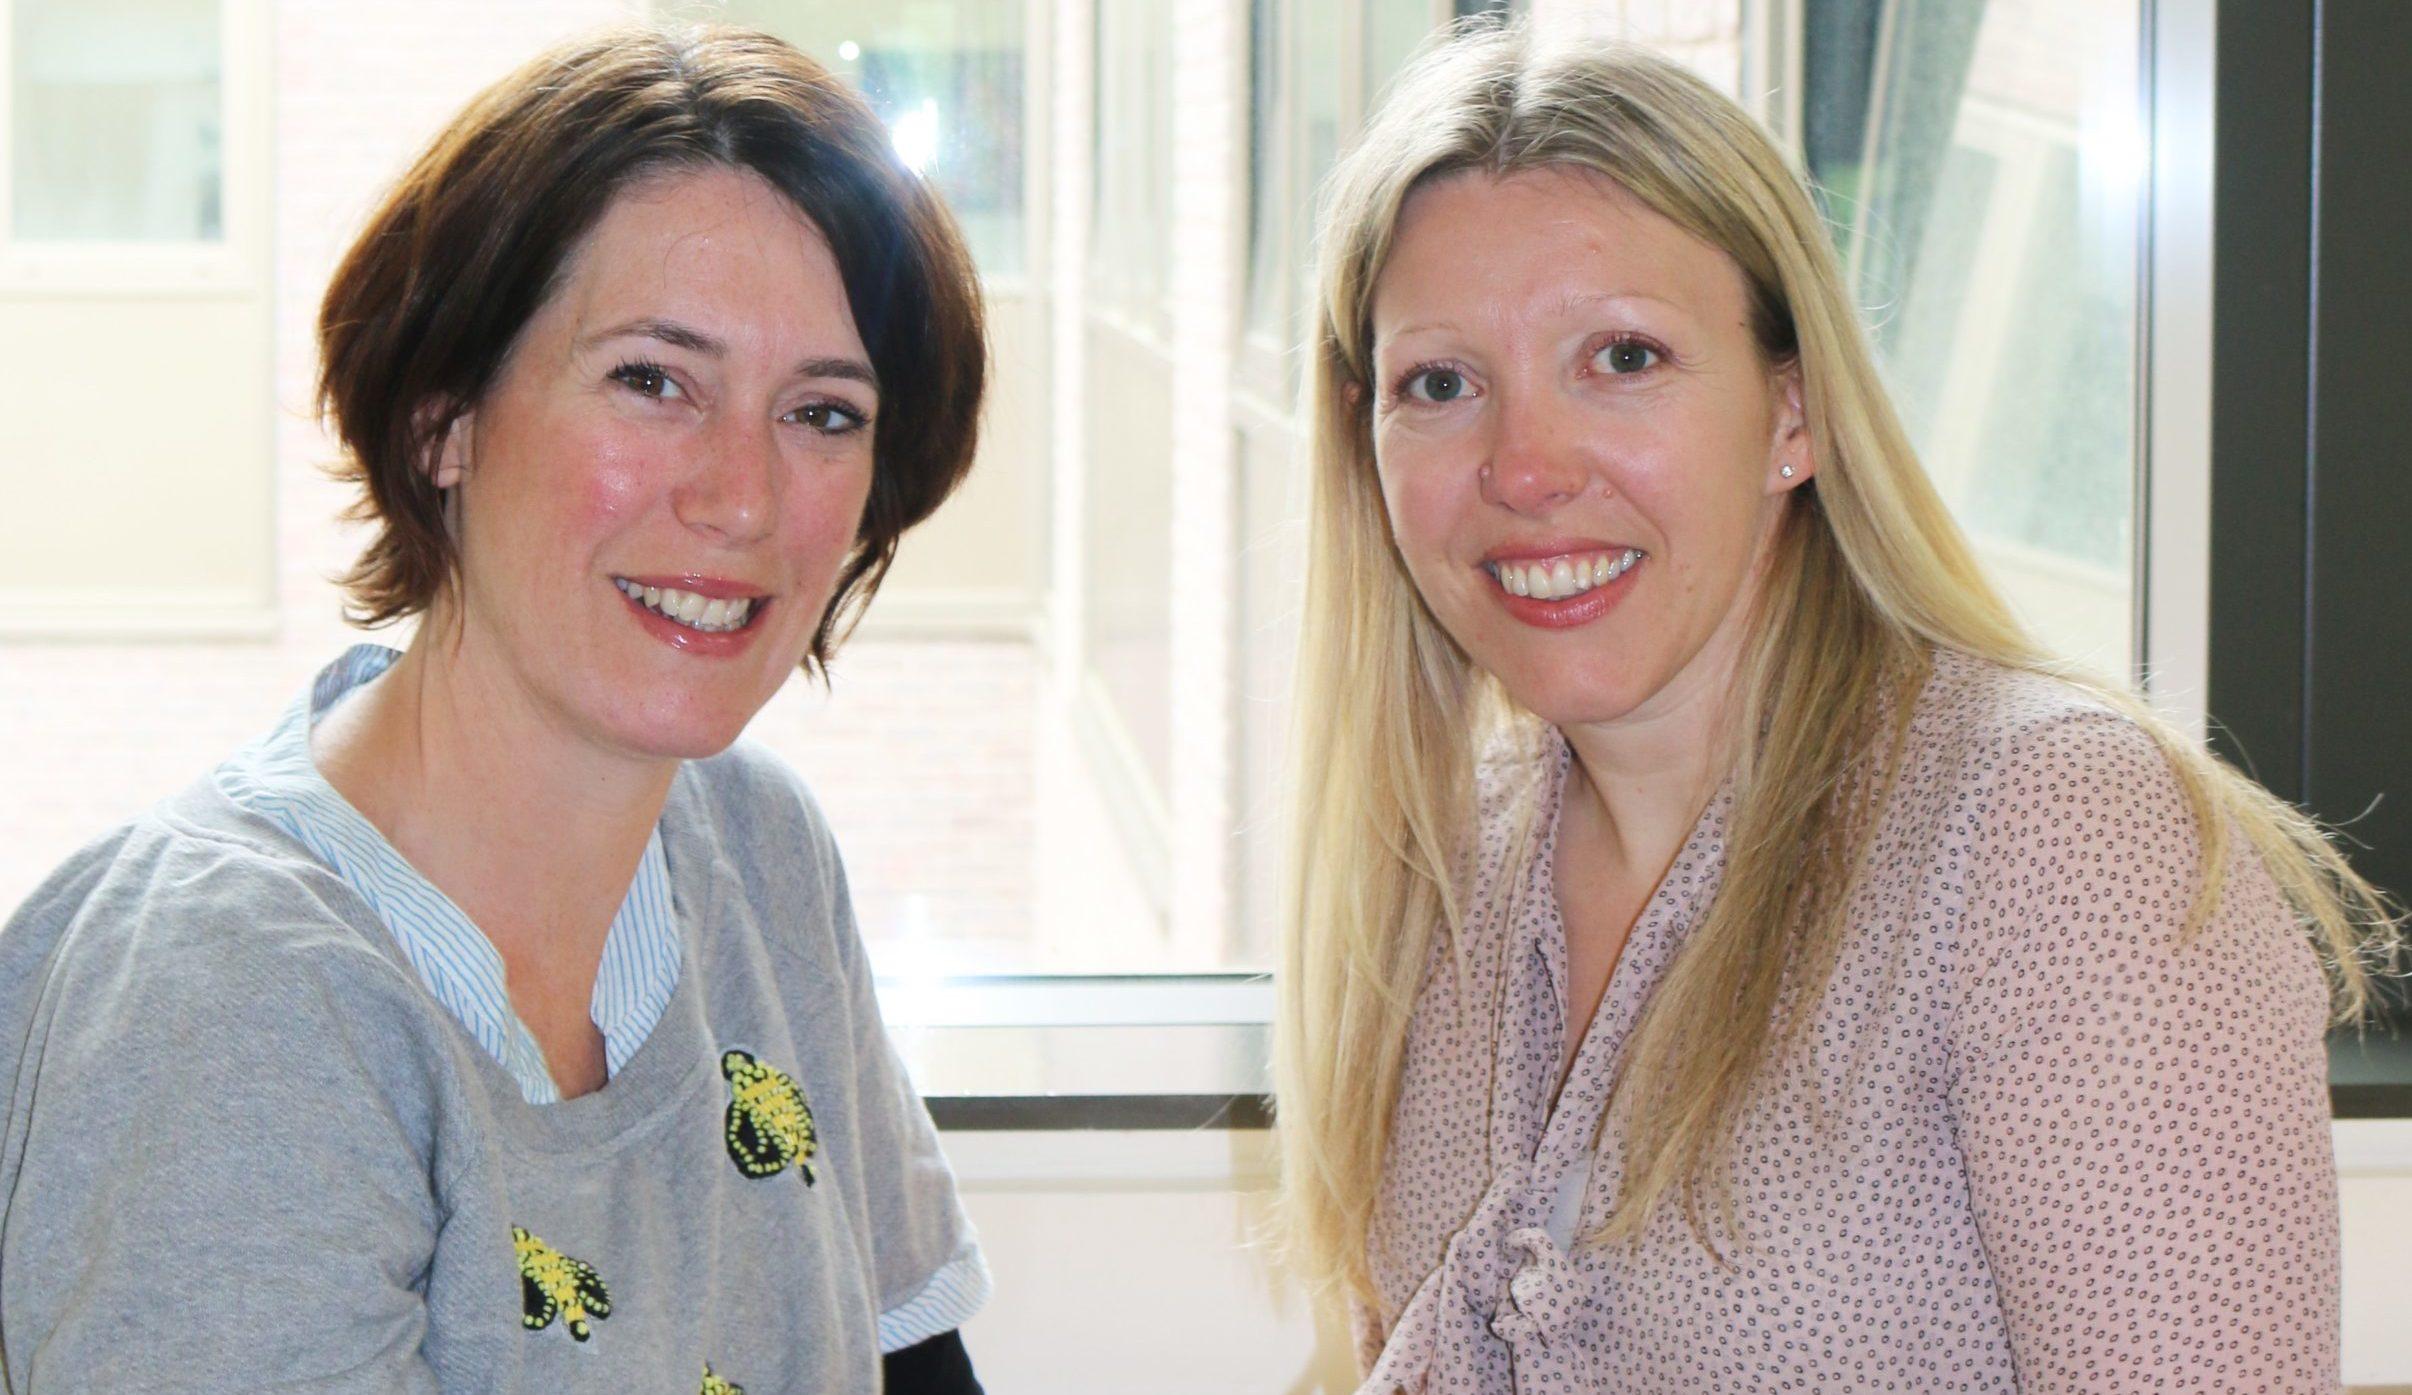 Dr Rachel Lewis and Dr Jo Yarker